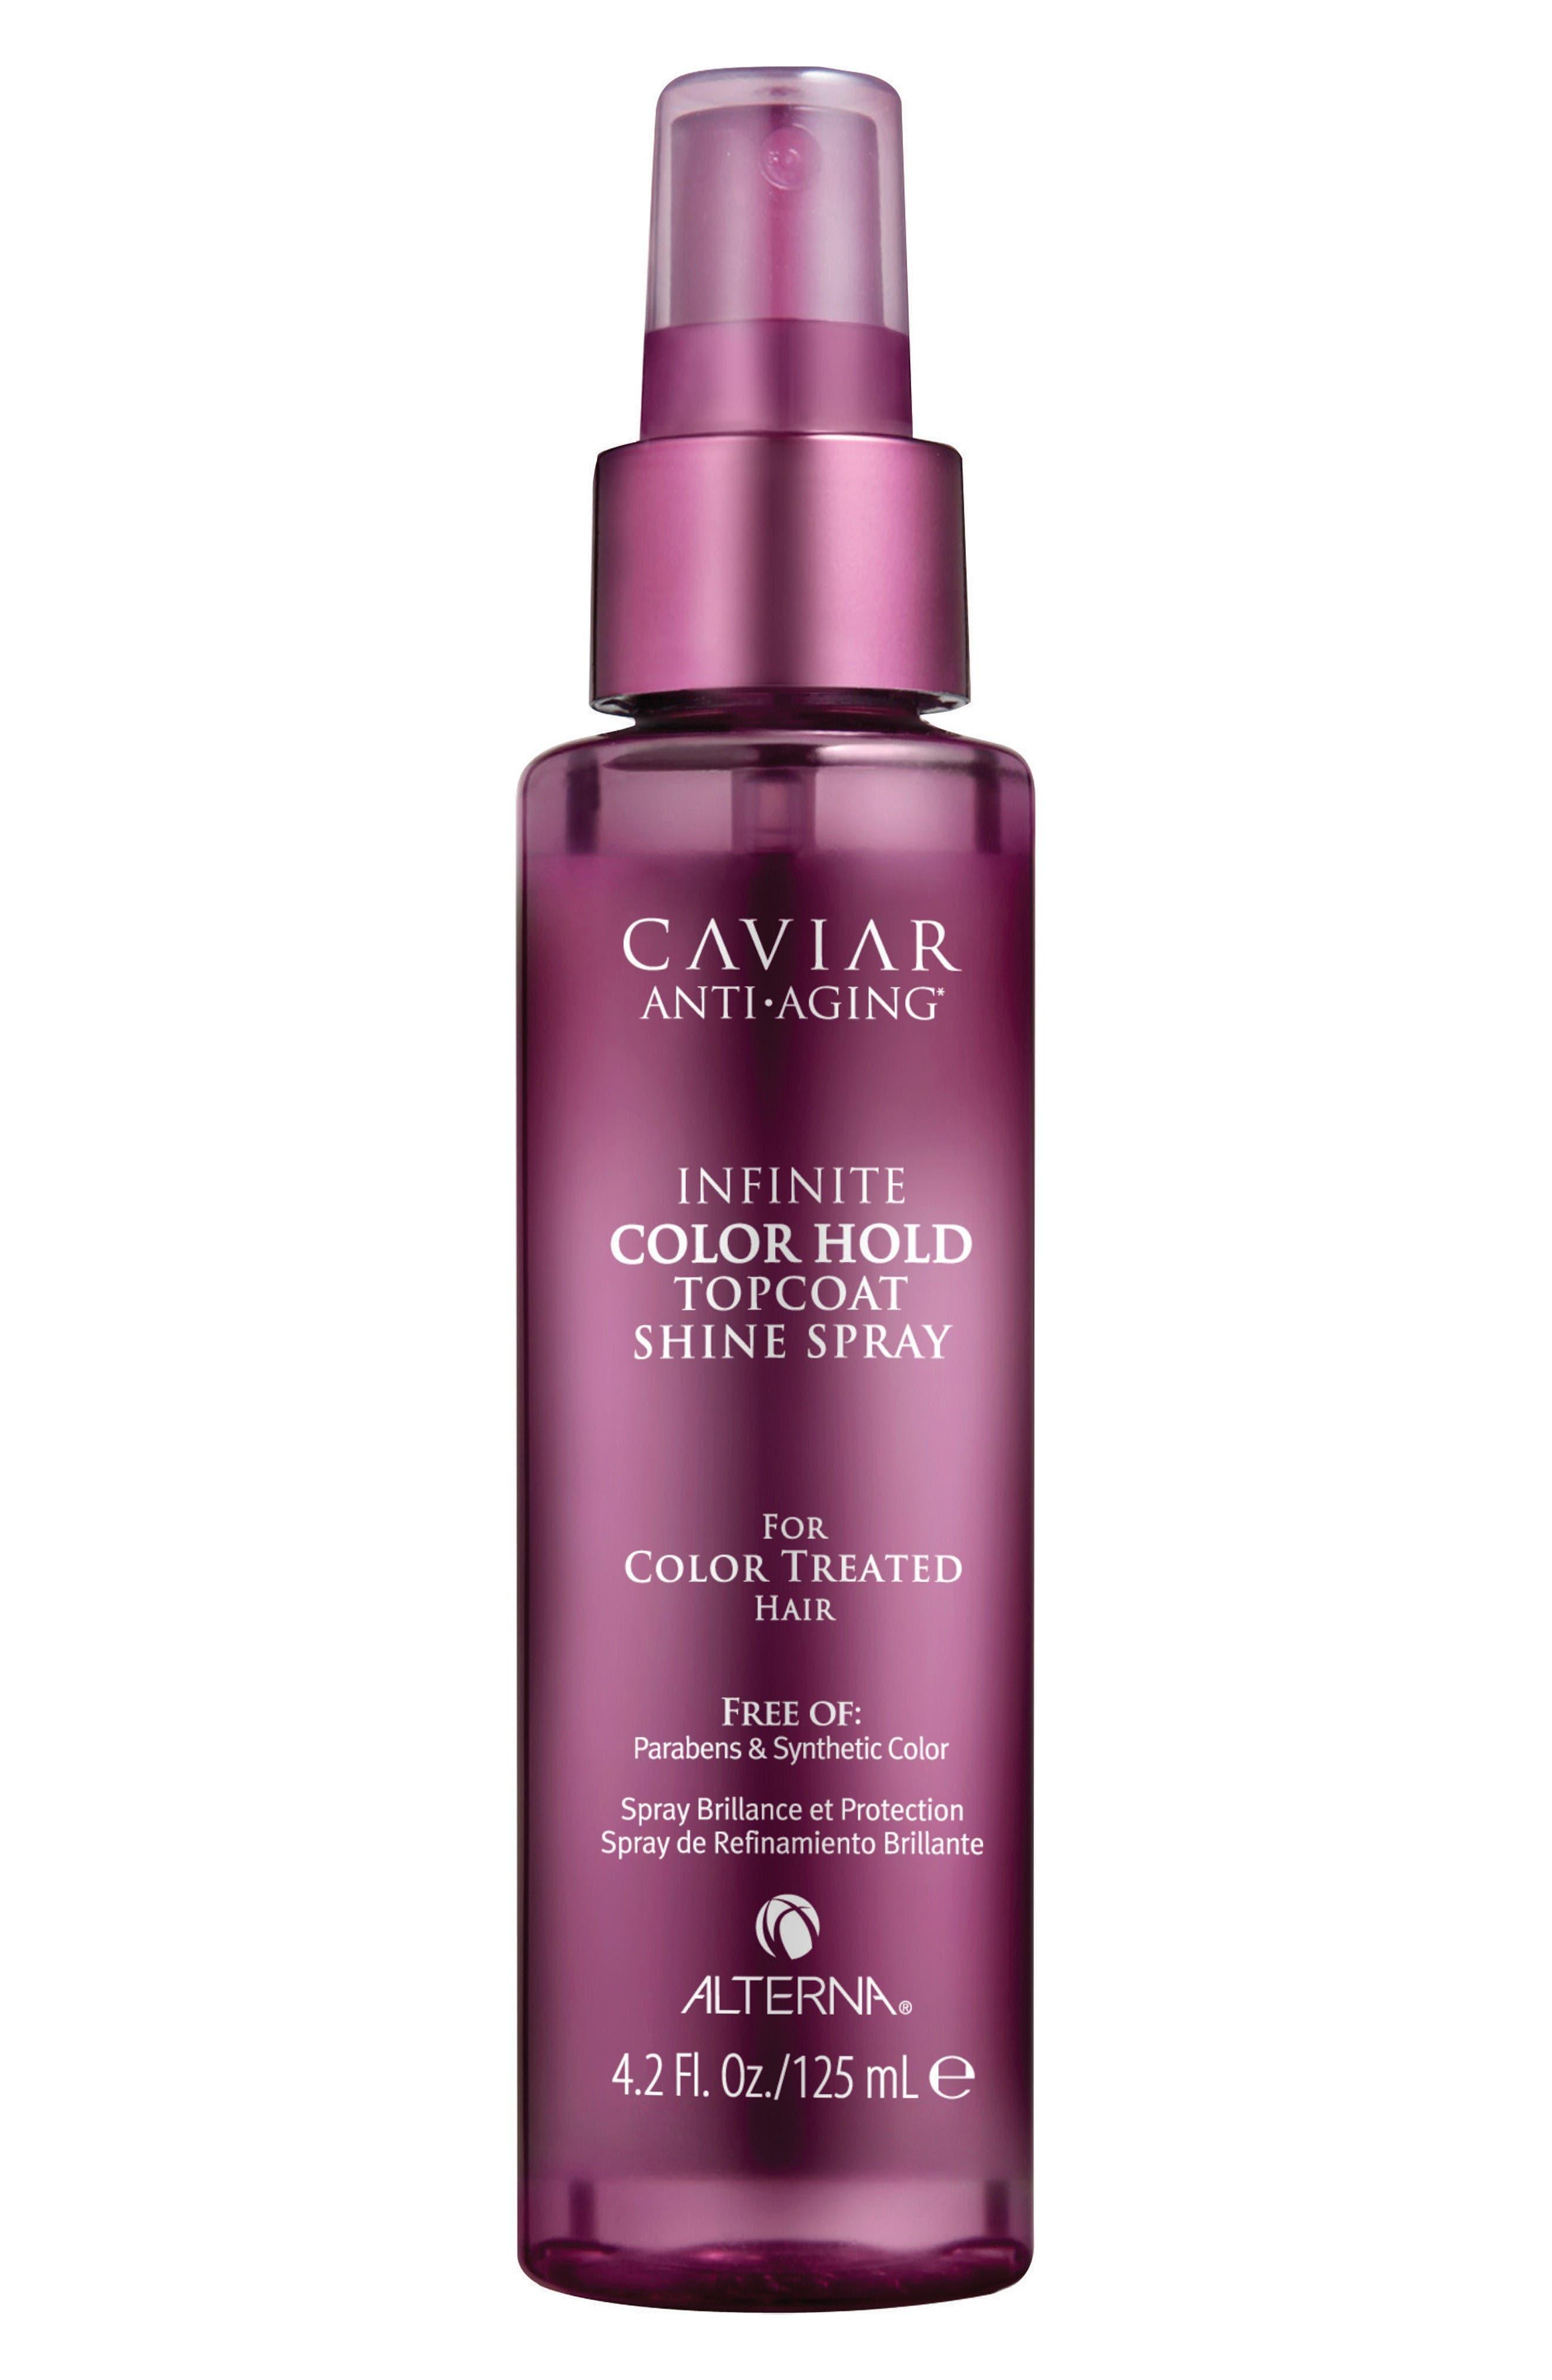 ALTERNA® Caviar Infinite Color Hold Topcoat Shine Spray